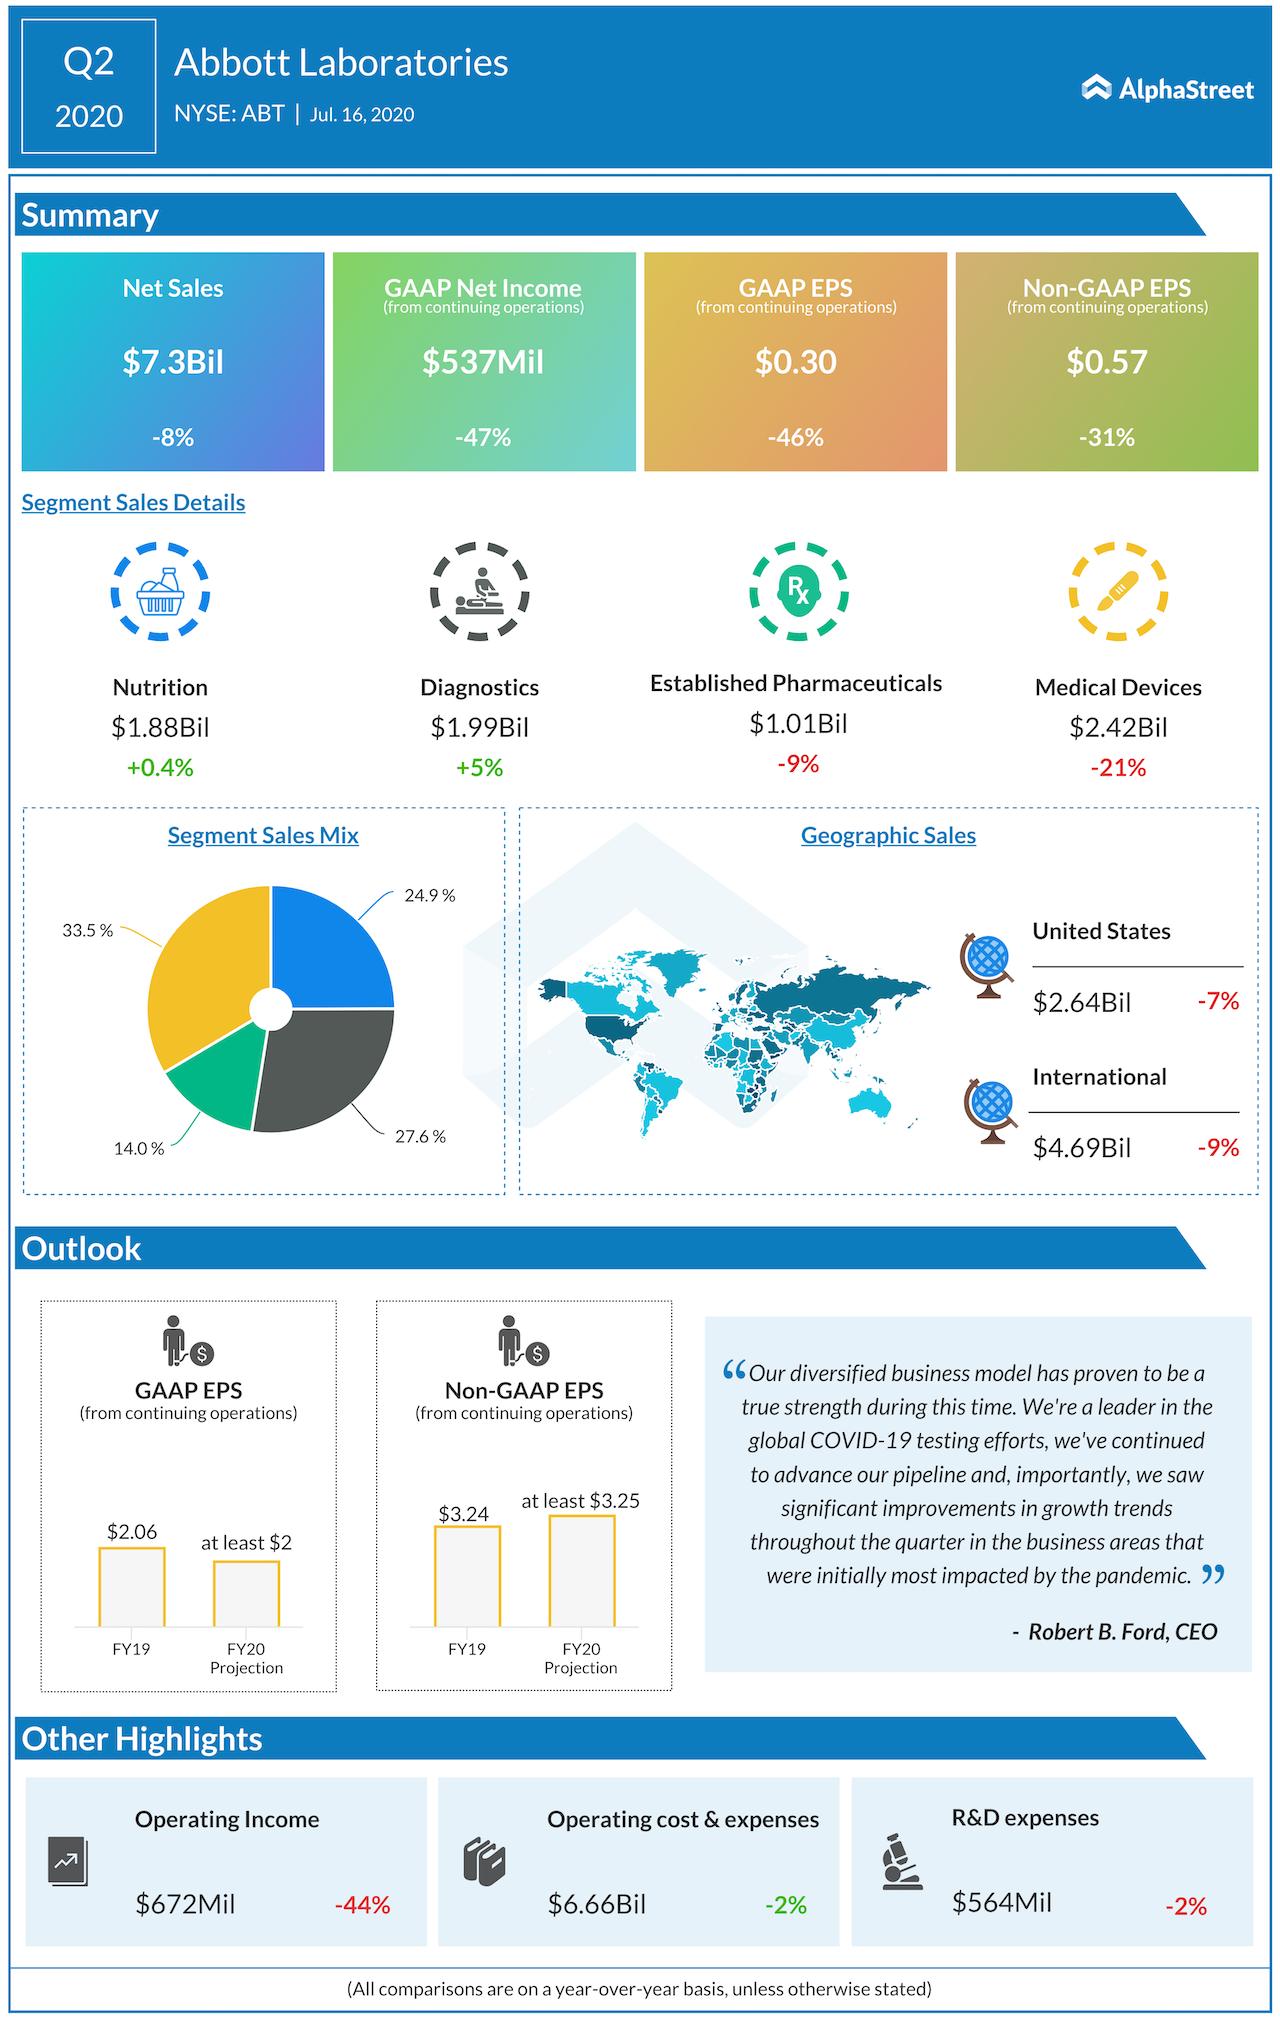 Abbott Laboratories Q2 2020 earnings infographic